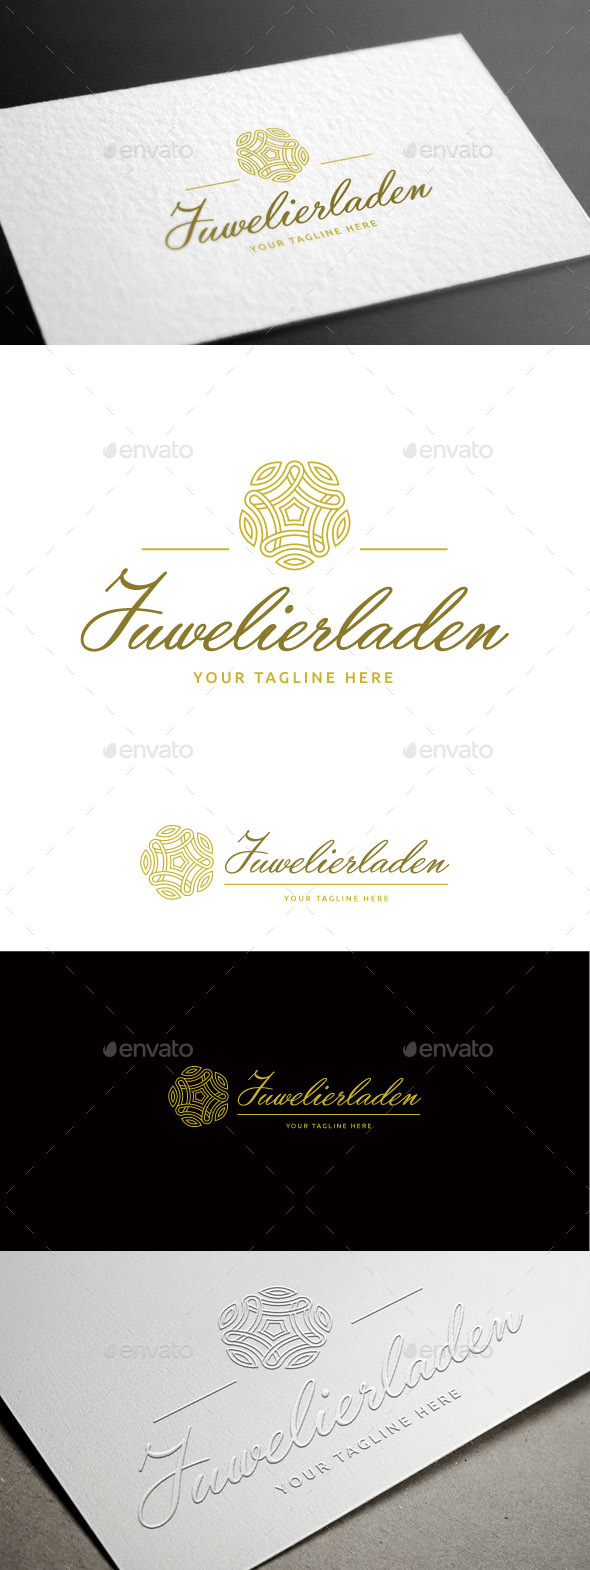 Juwelierladen Logo Template